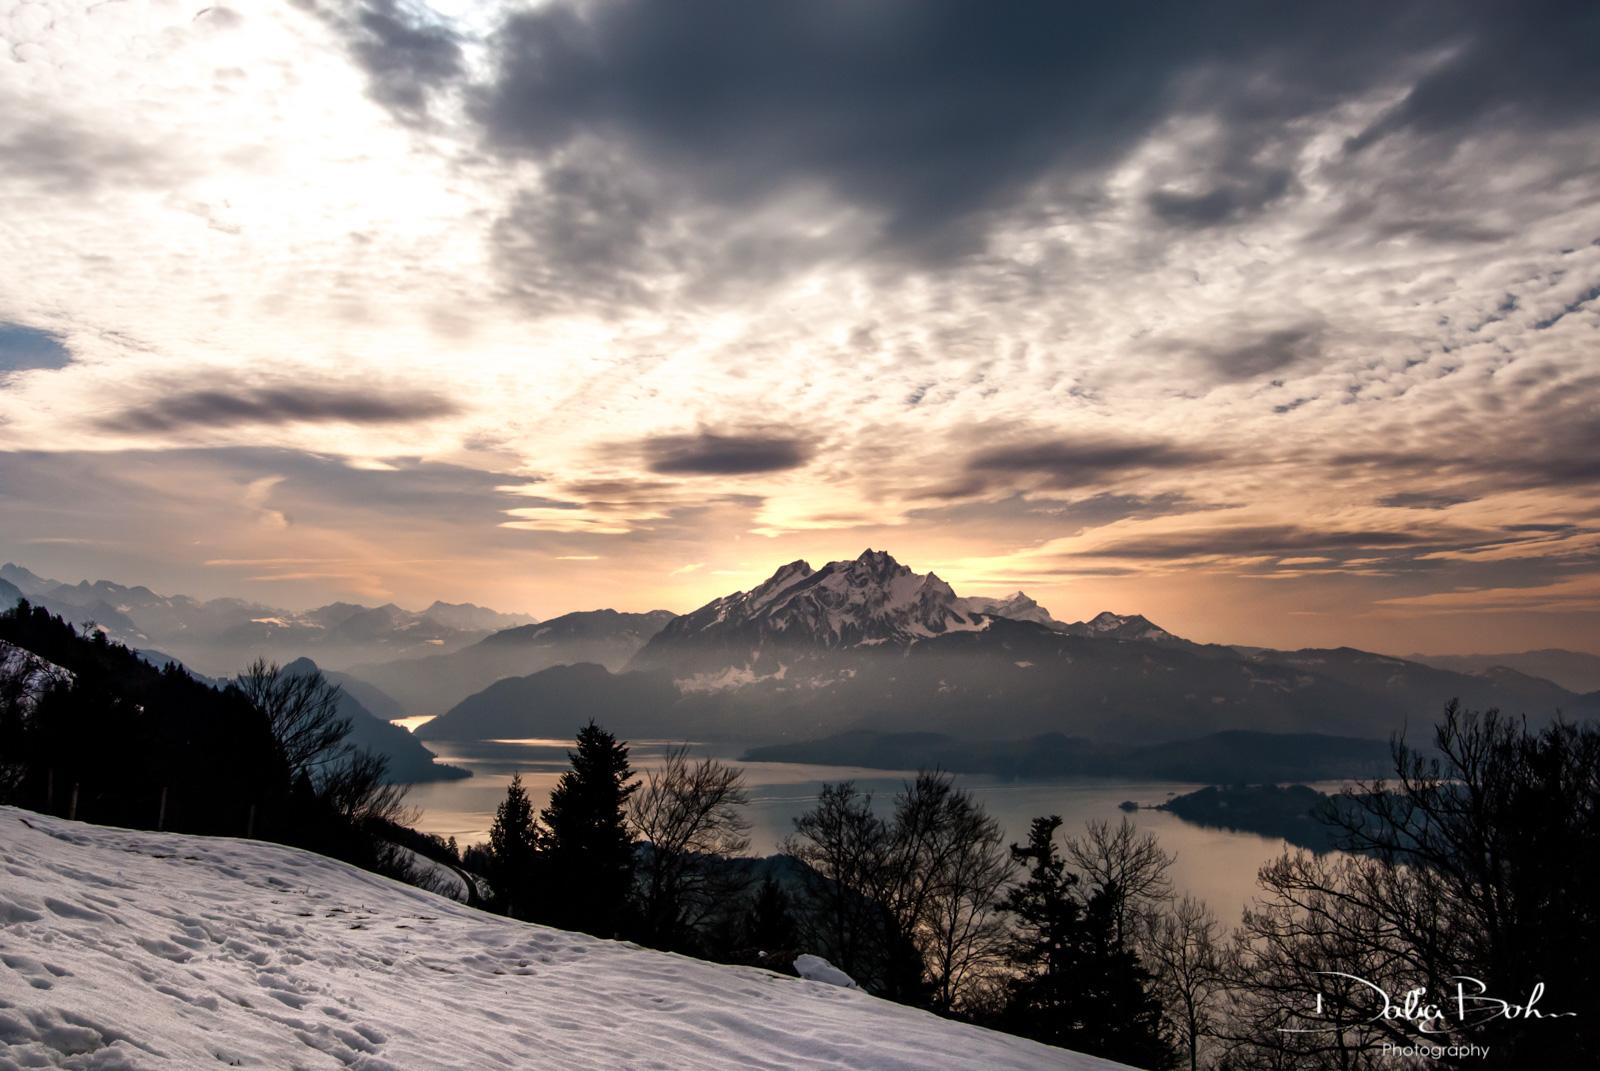 Schweiz | Schwyz | Rigi-Seebodenalp